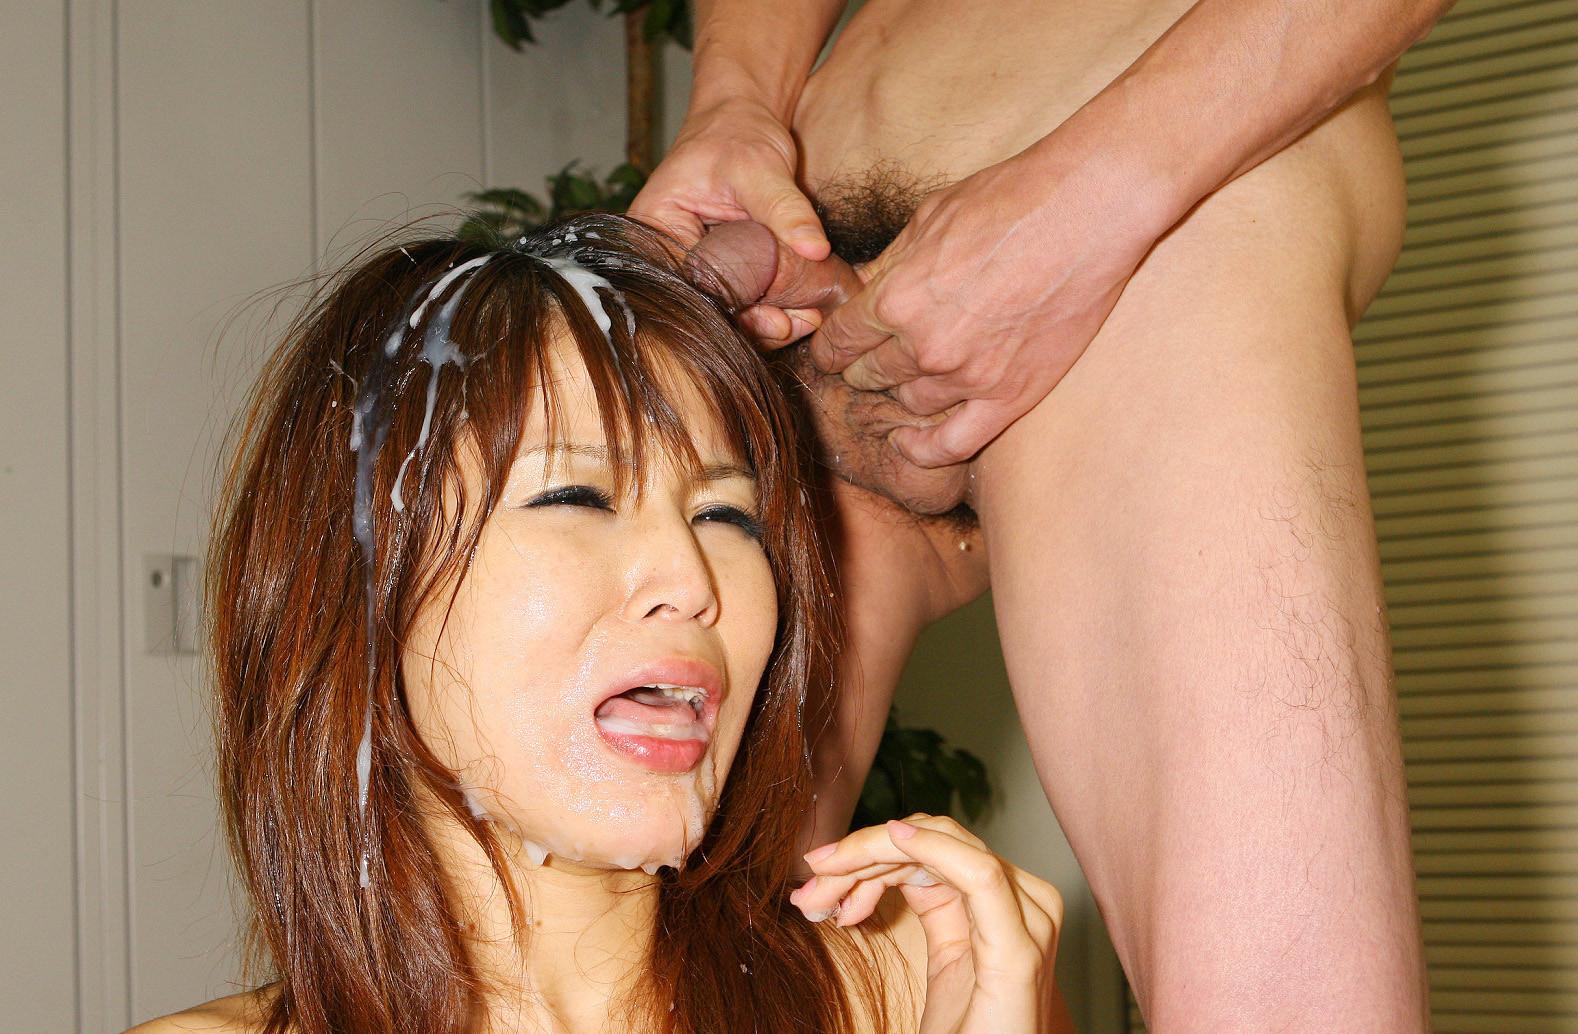 Japanese hard rough sex